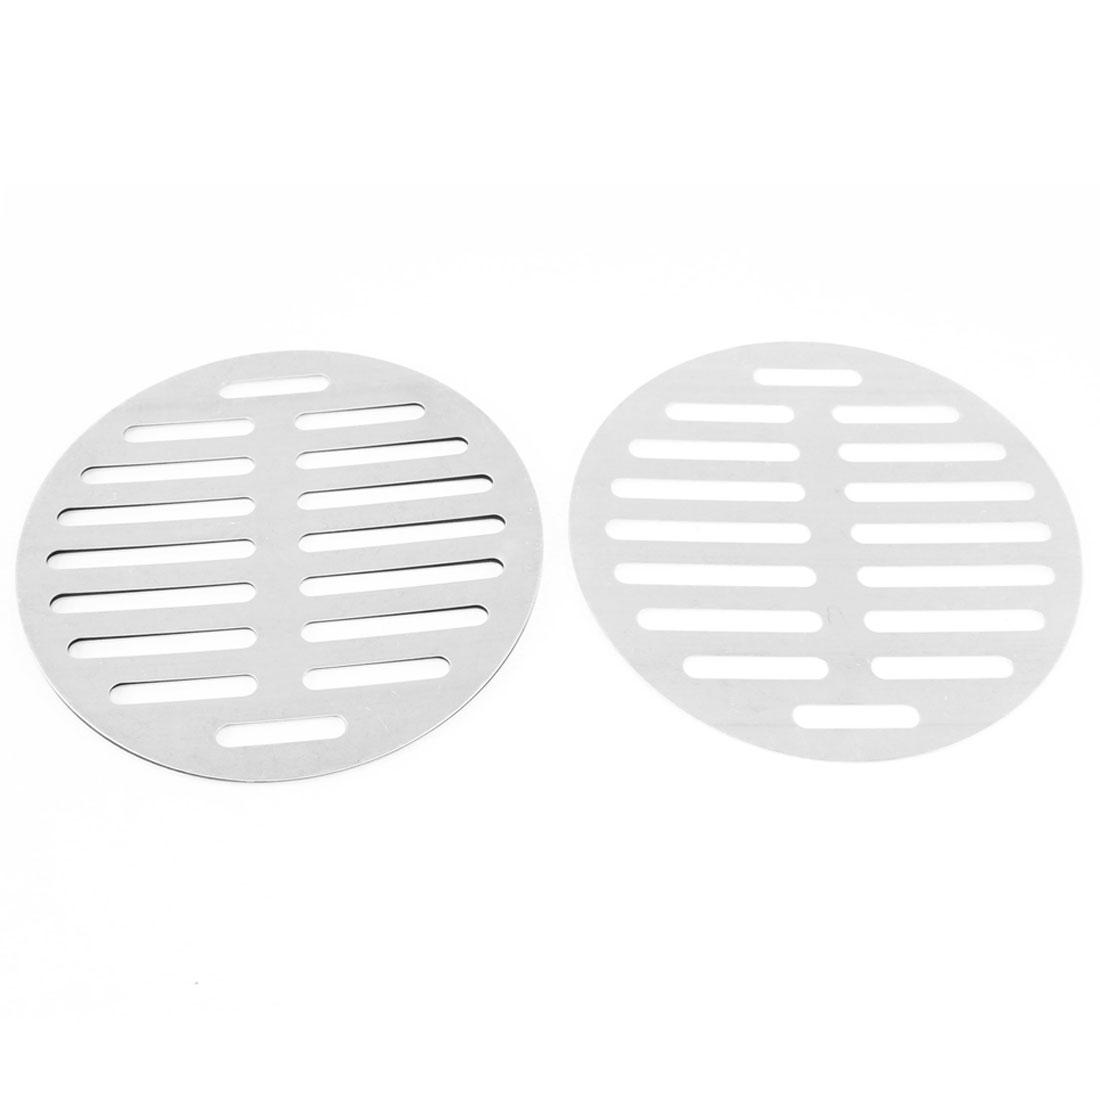 "Stainless Steel Kitchen Bathroom Round Floor Drain Cover 6"" 15cm 3Pcs"